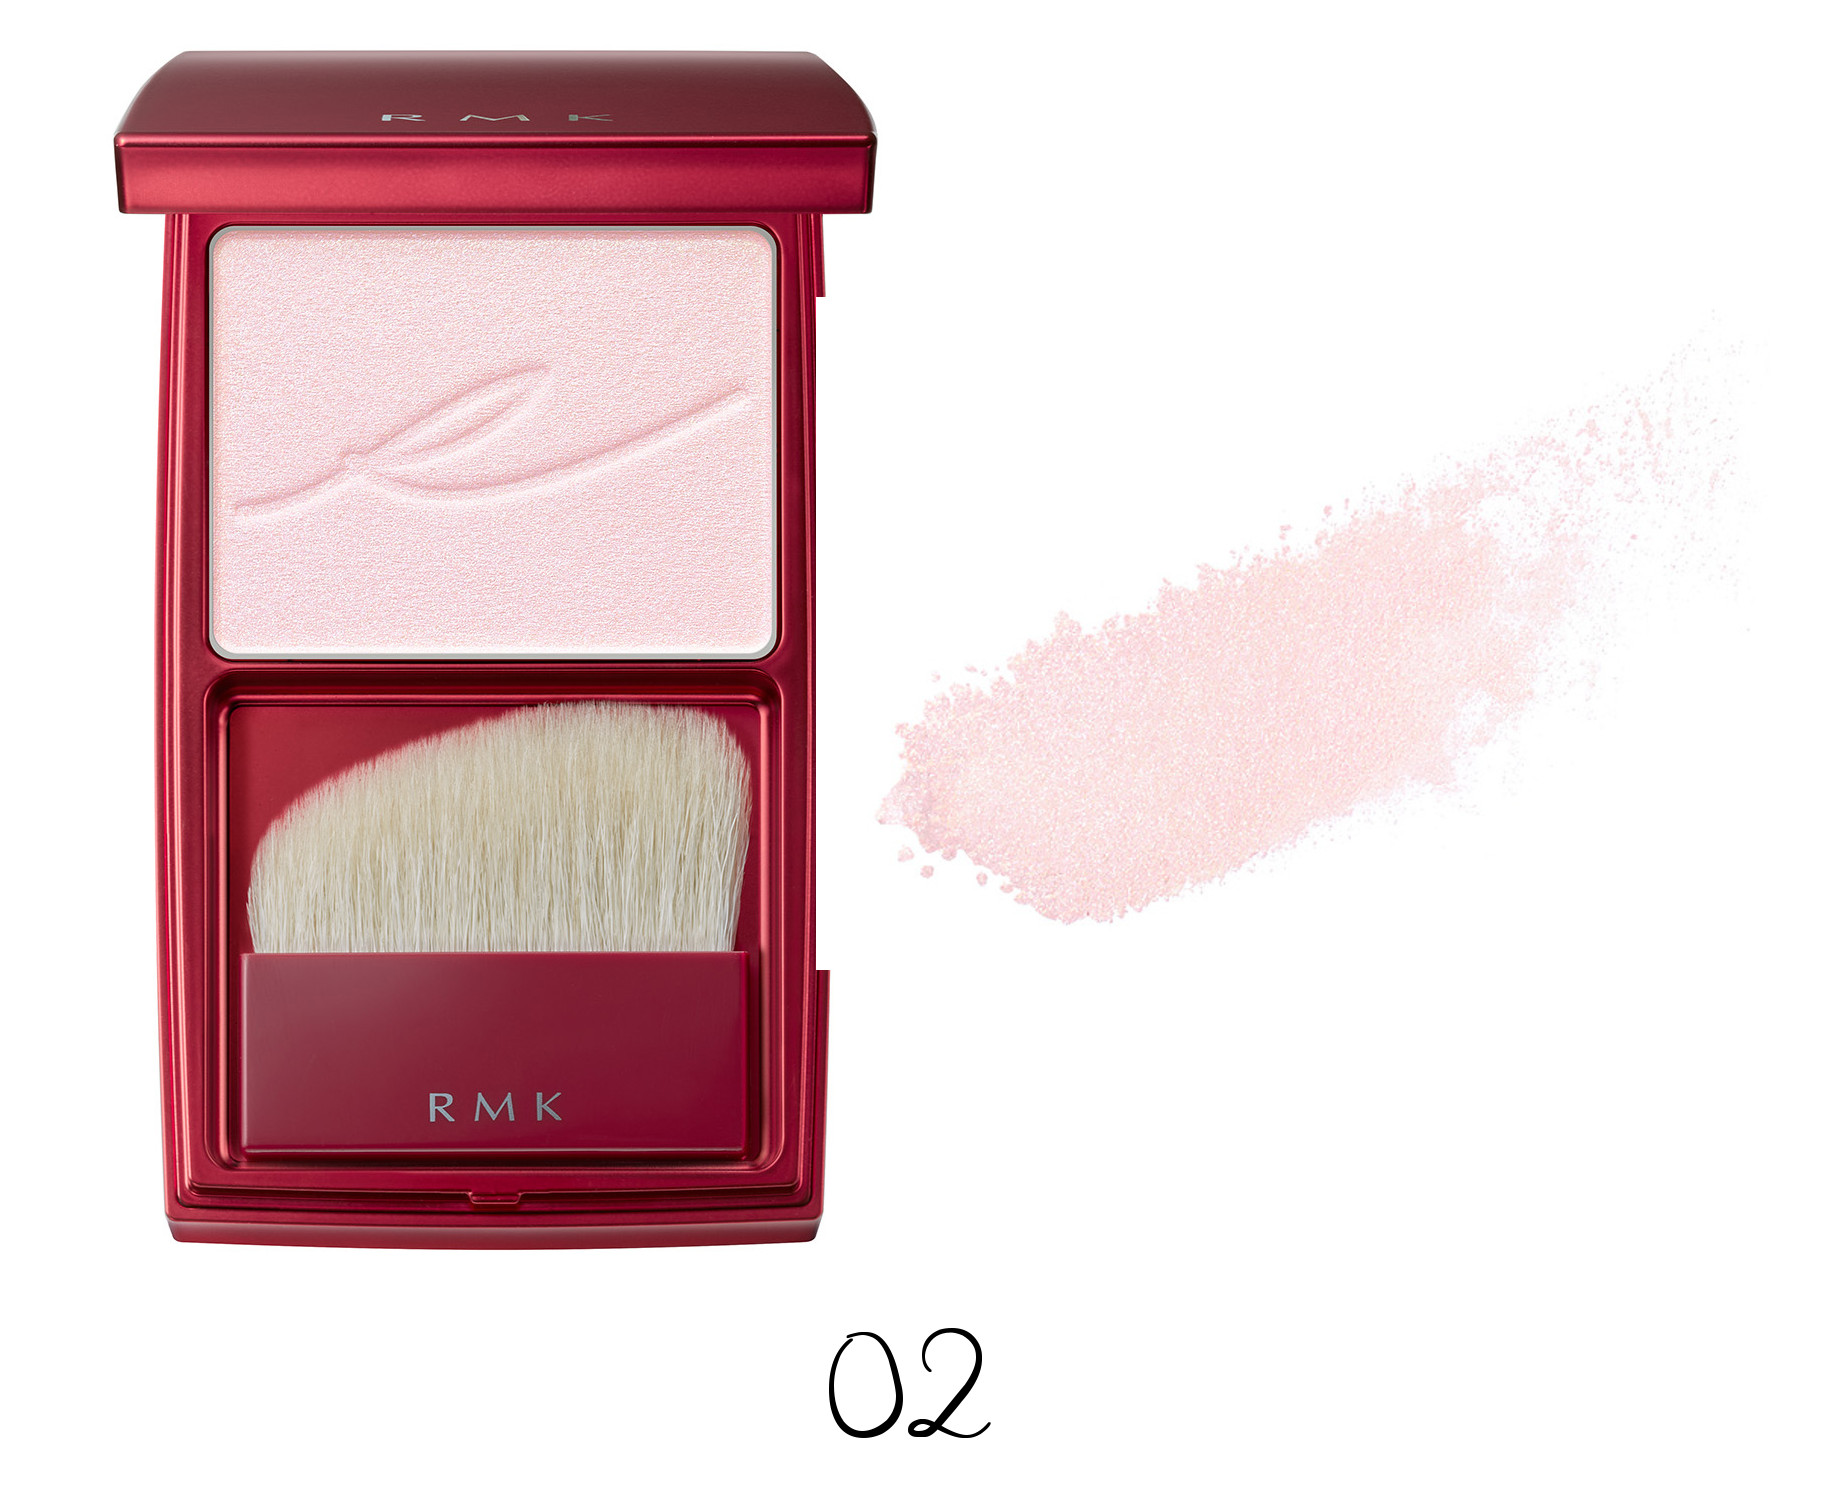 RMK Autumn Winter Collection 2020 Edozakura Translucent Powder 02